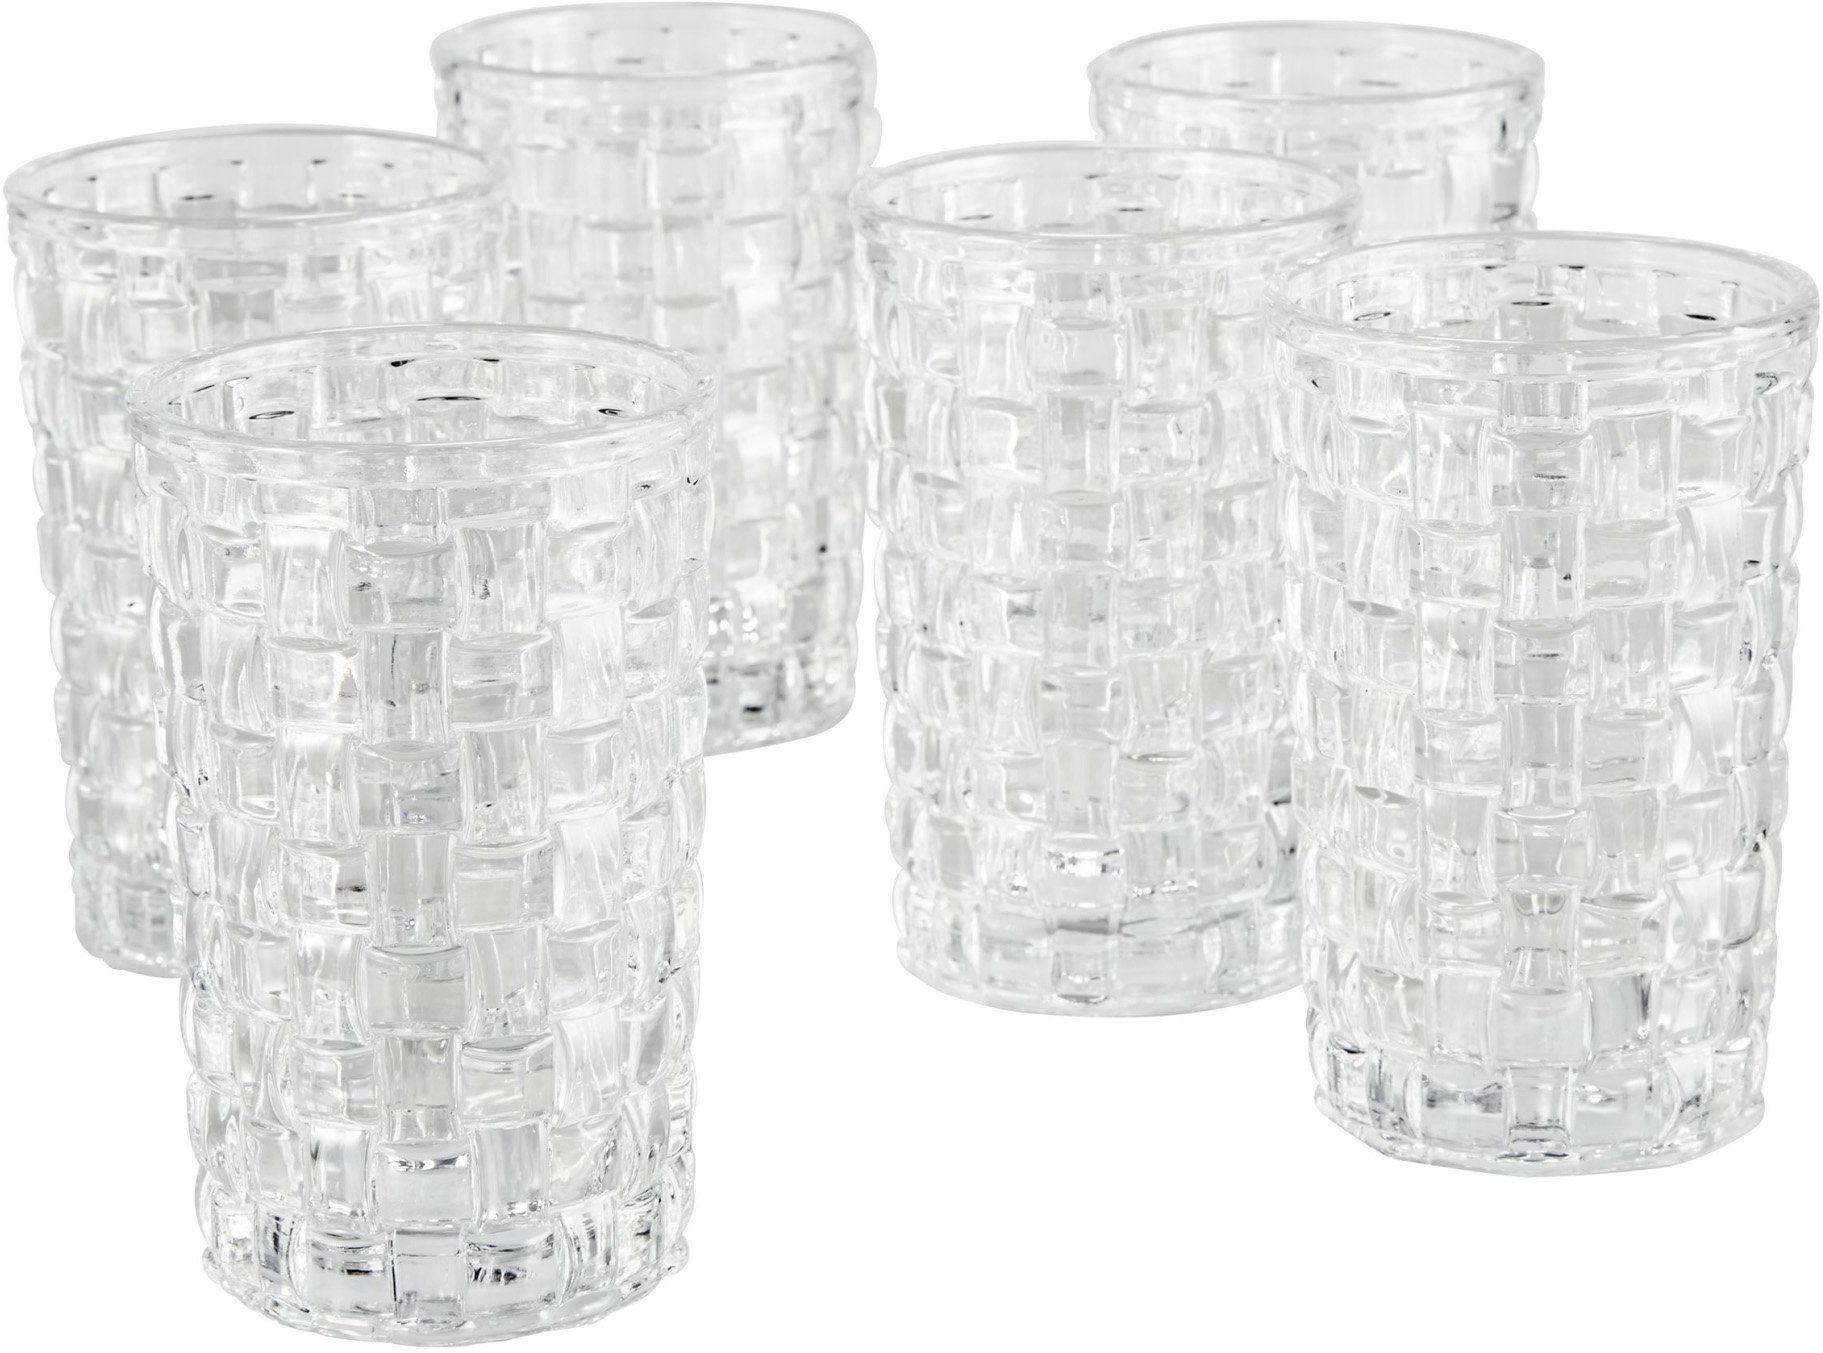 Mailord Gläser-Set, 6-teilig, »Woven«